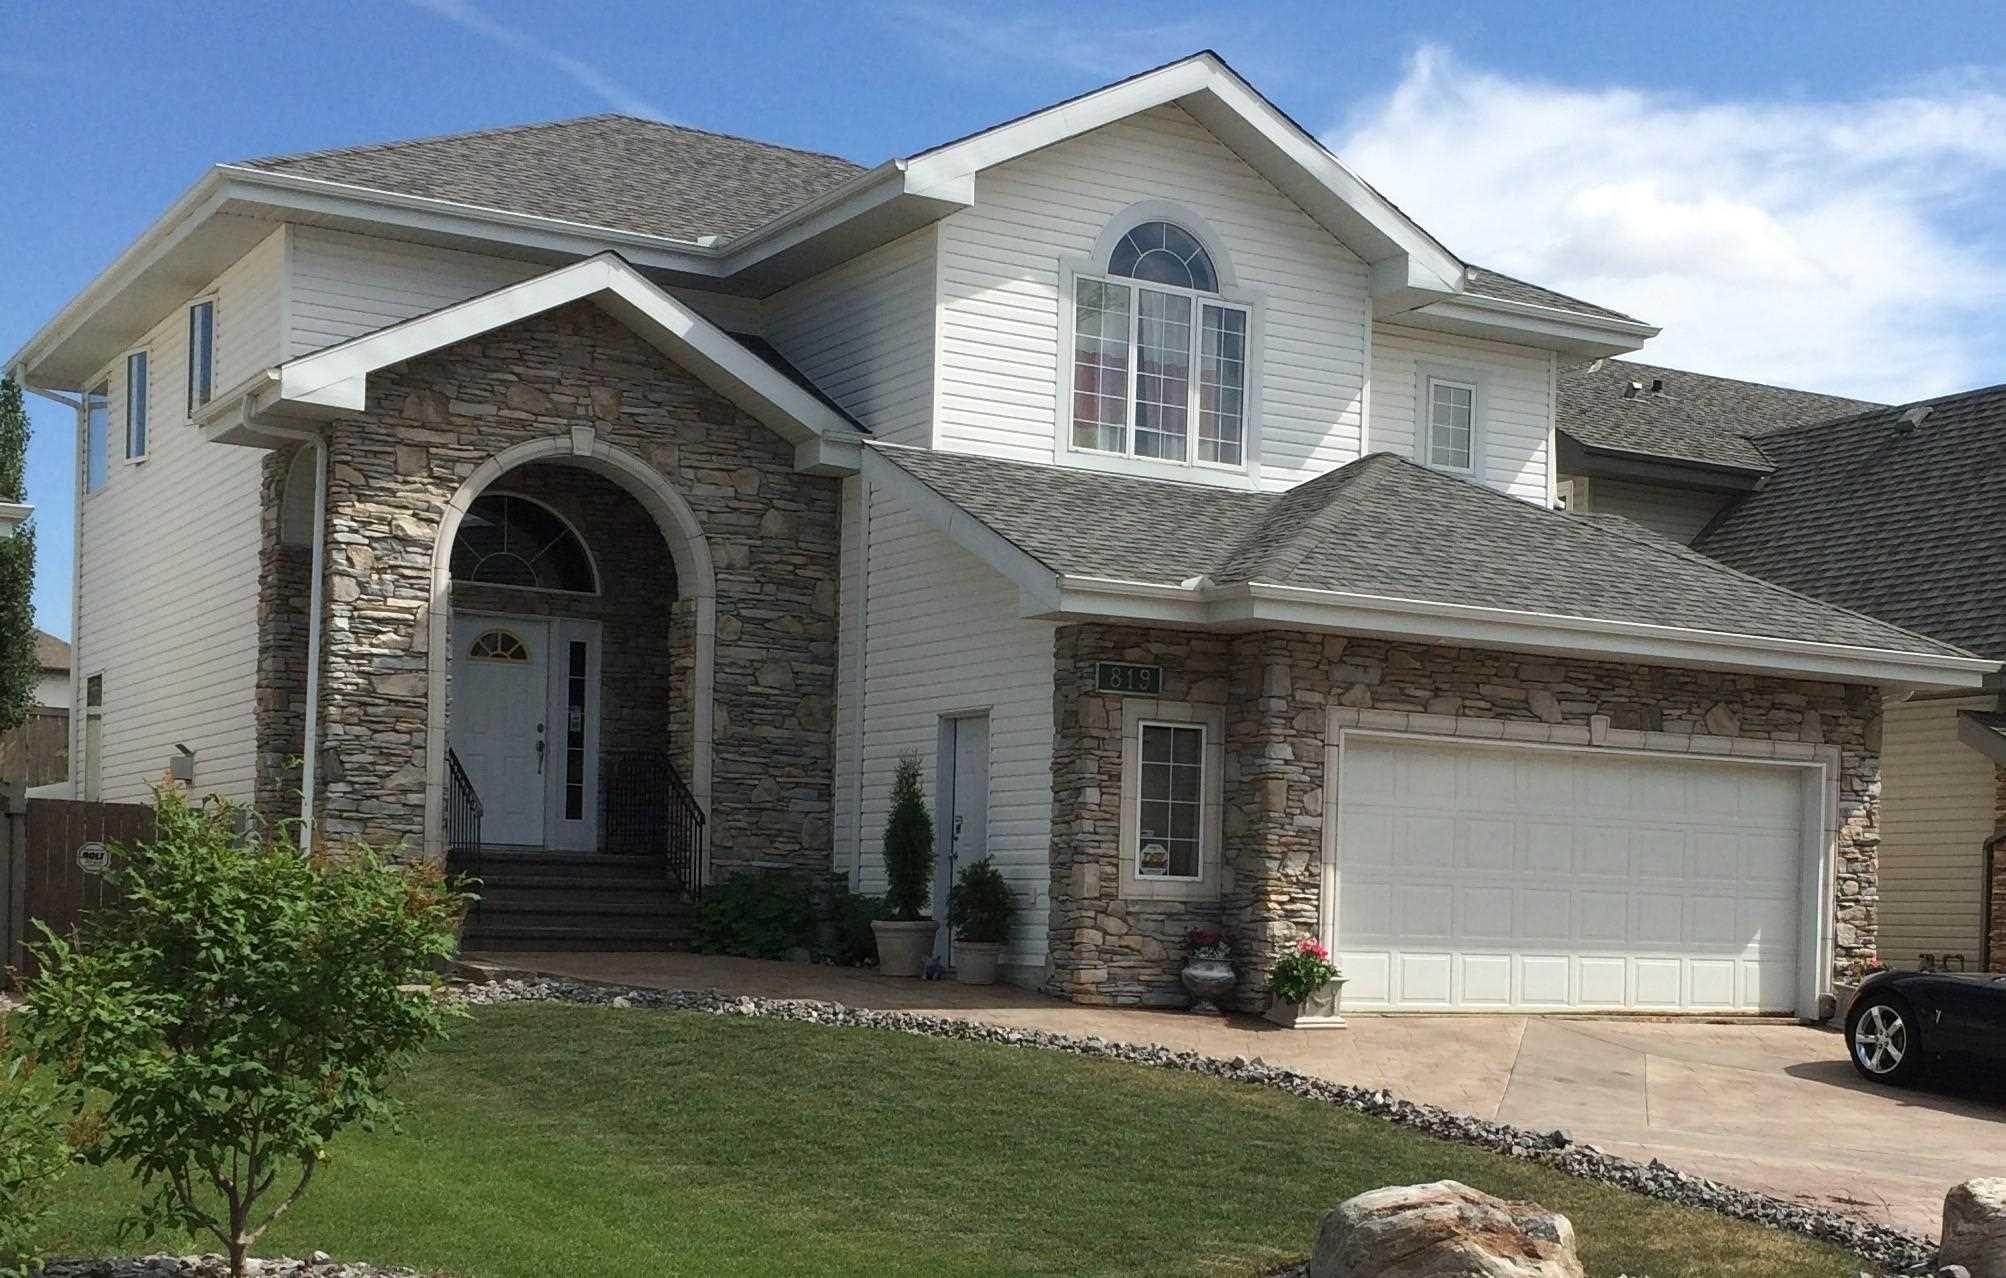 Main Photo: 819 TWIN BROOKS Close in Edmonton: Zone 16 House for sale : MLS®# E4249493